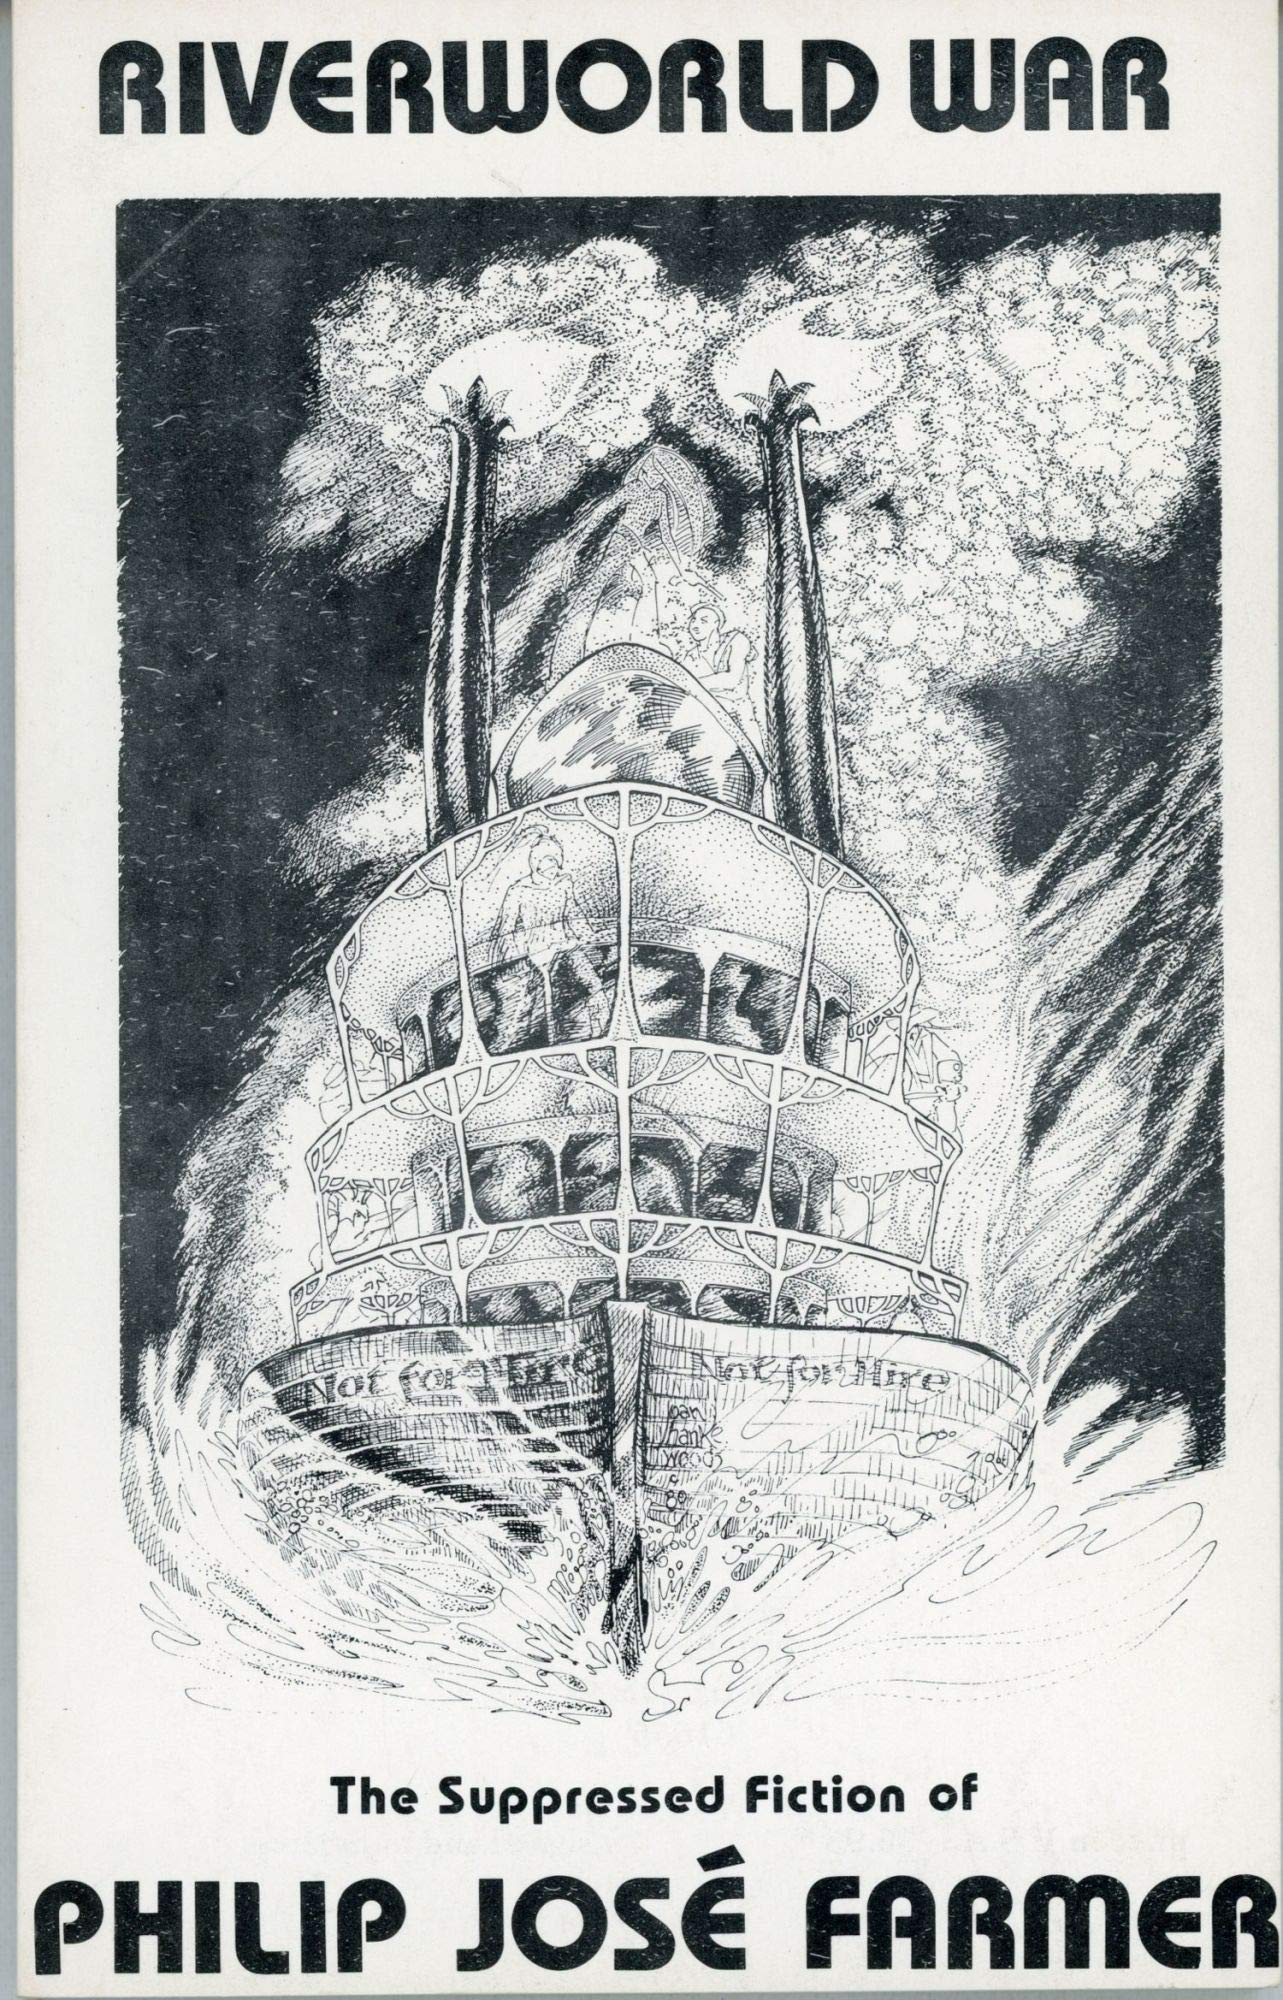 Riverworld War: The Suppressed Fiction of Philip José Farmer